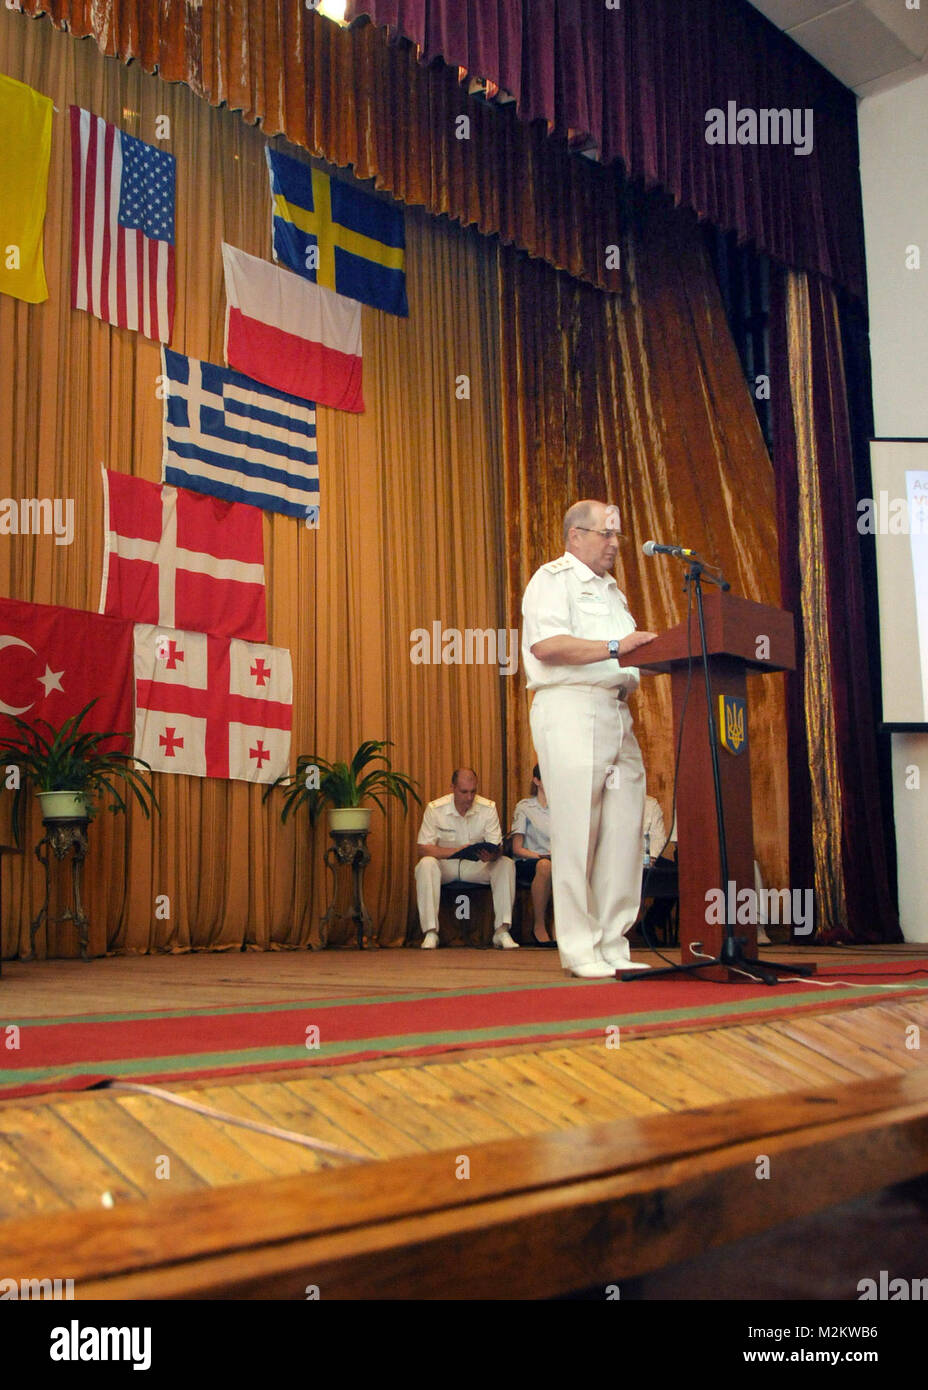 100712-N-6138K-047 ODESSA, Ukraine (July 12, 2010)—Ukranian Vice Adm. Viktor Maksimov, commander and chief of Ukranian - Stock Image